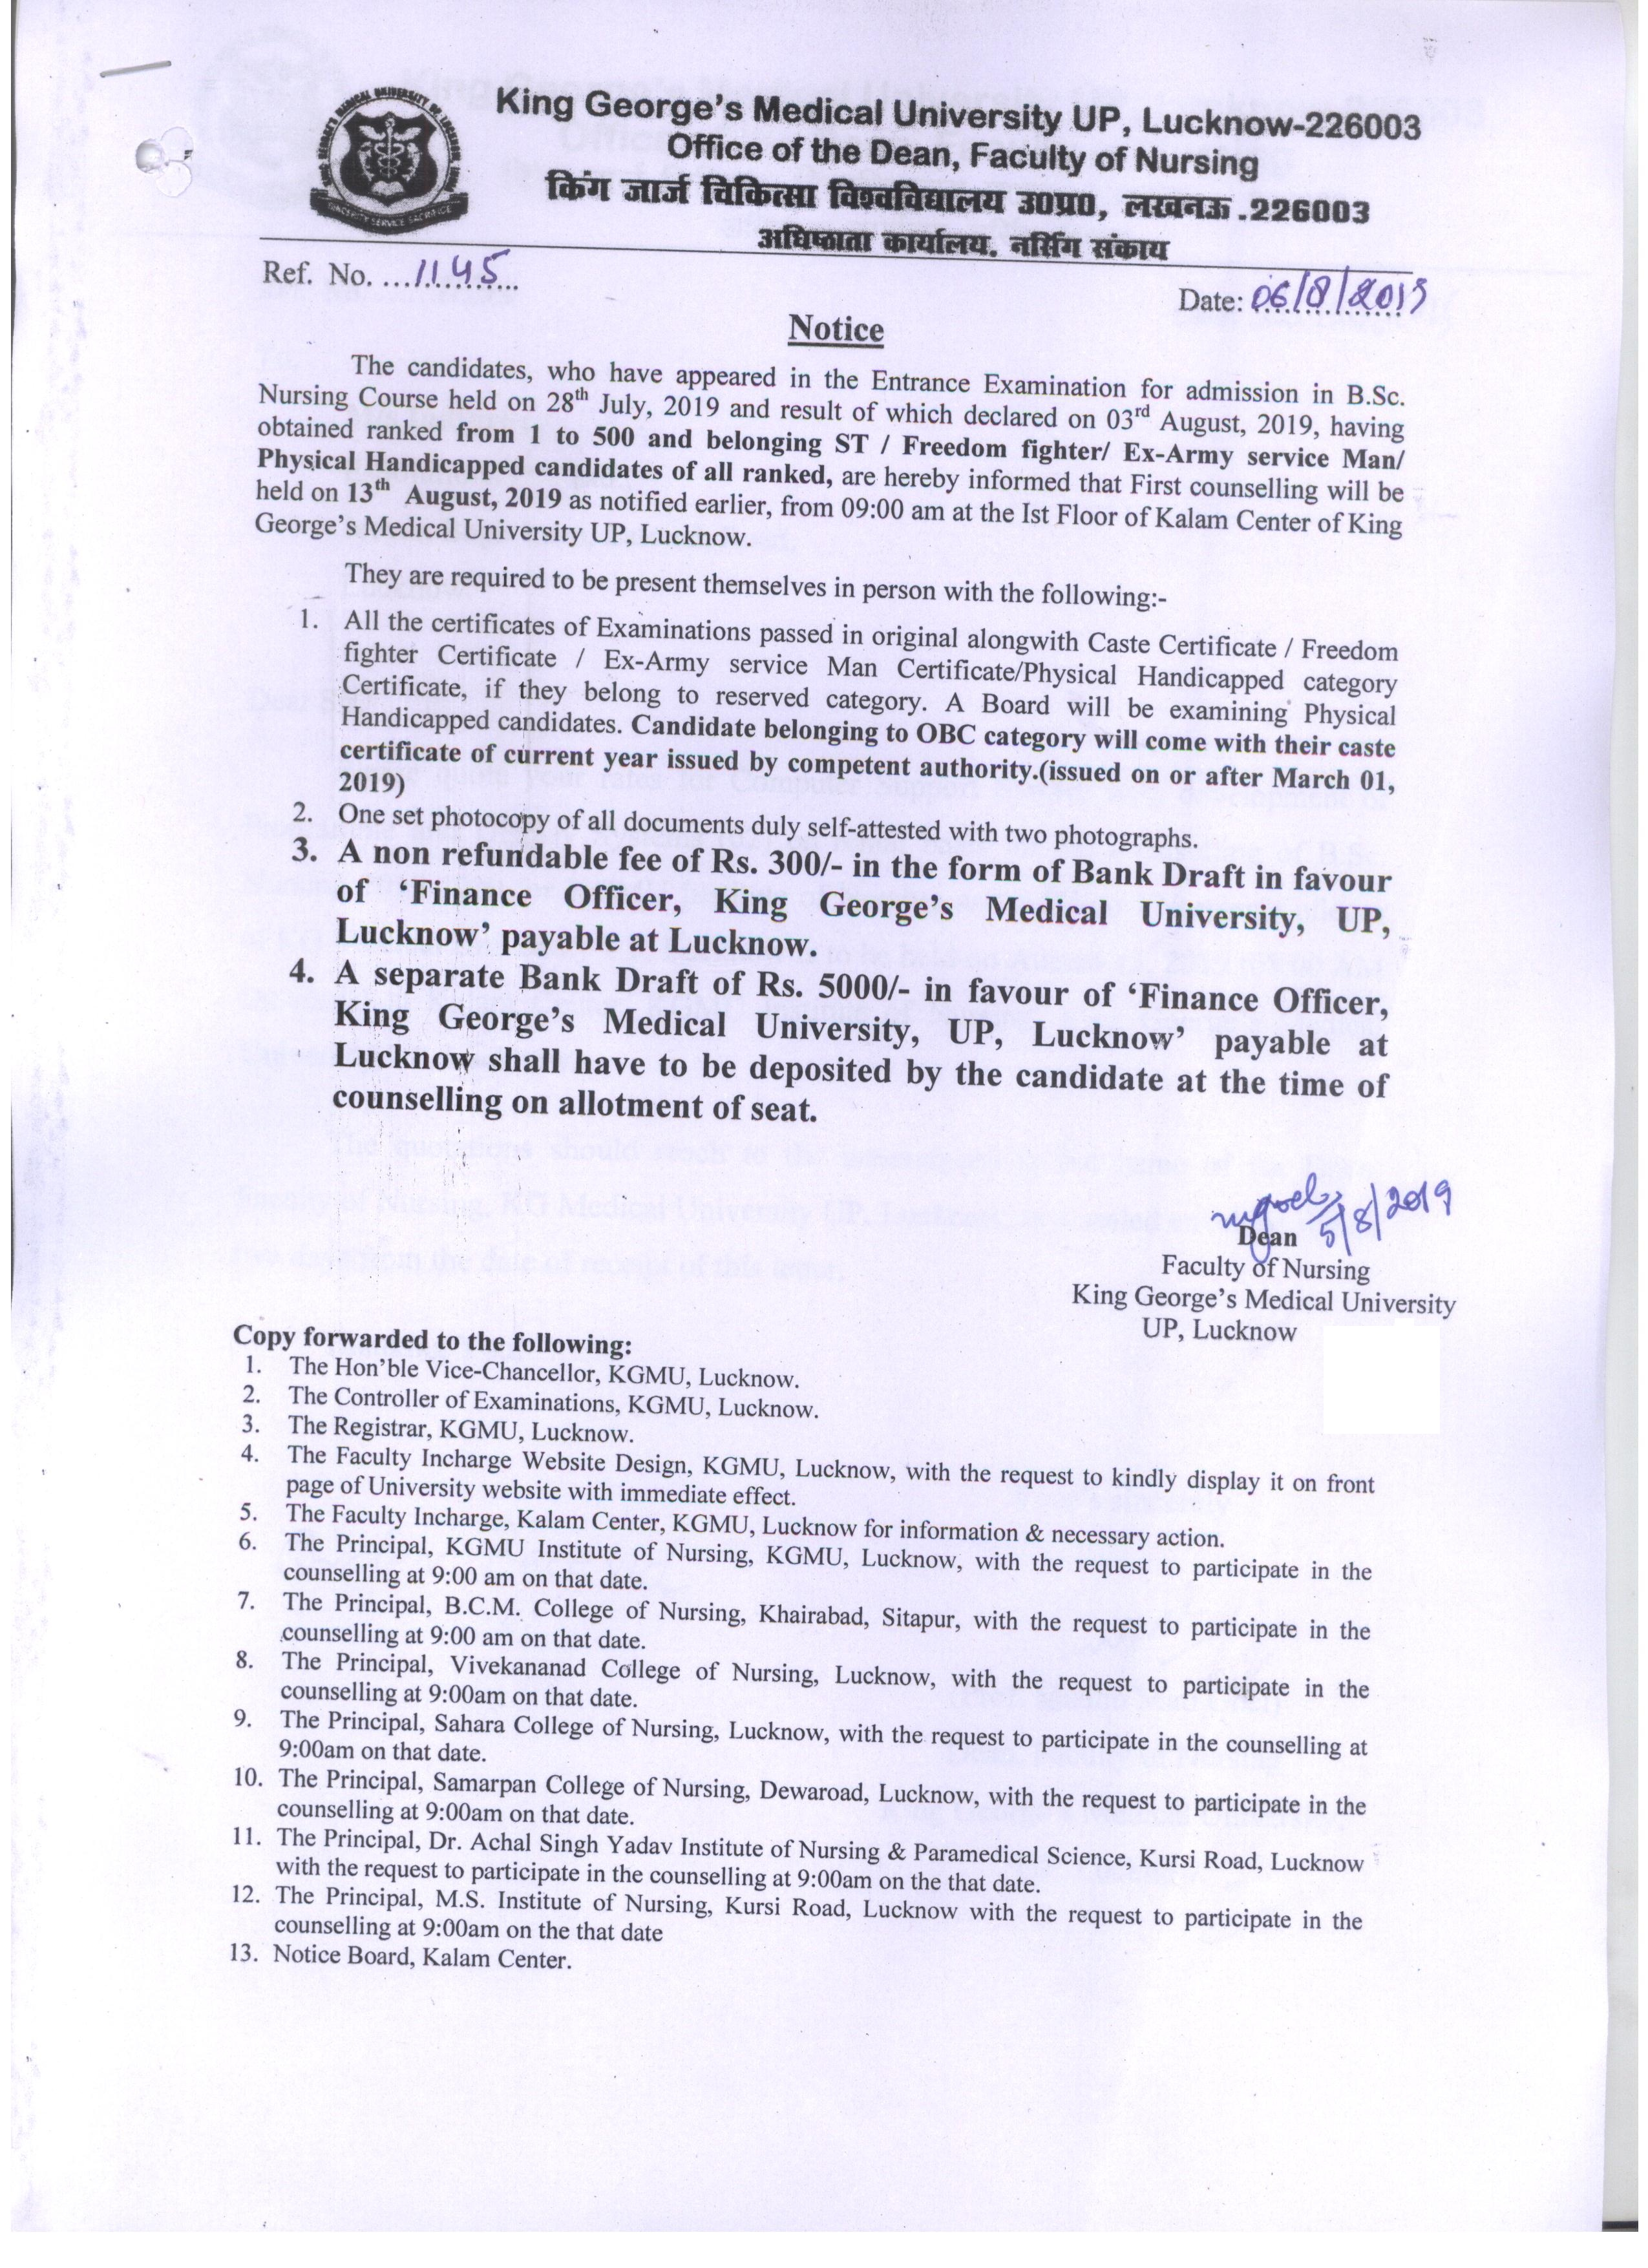 King George's Medical University, Chowk, Lucknow U P  INDIA